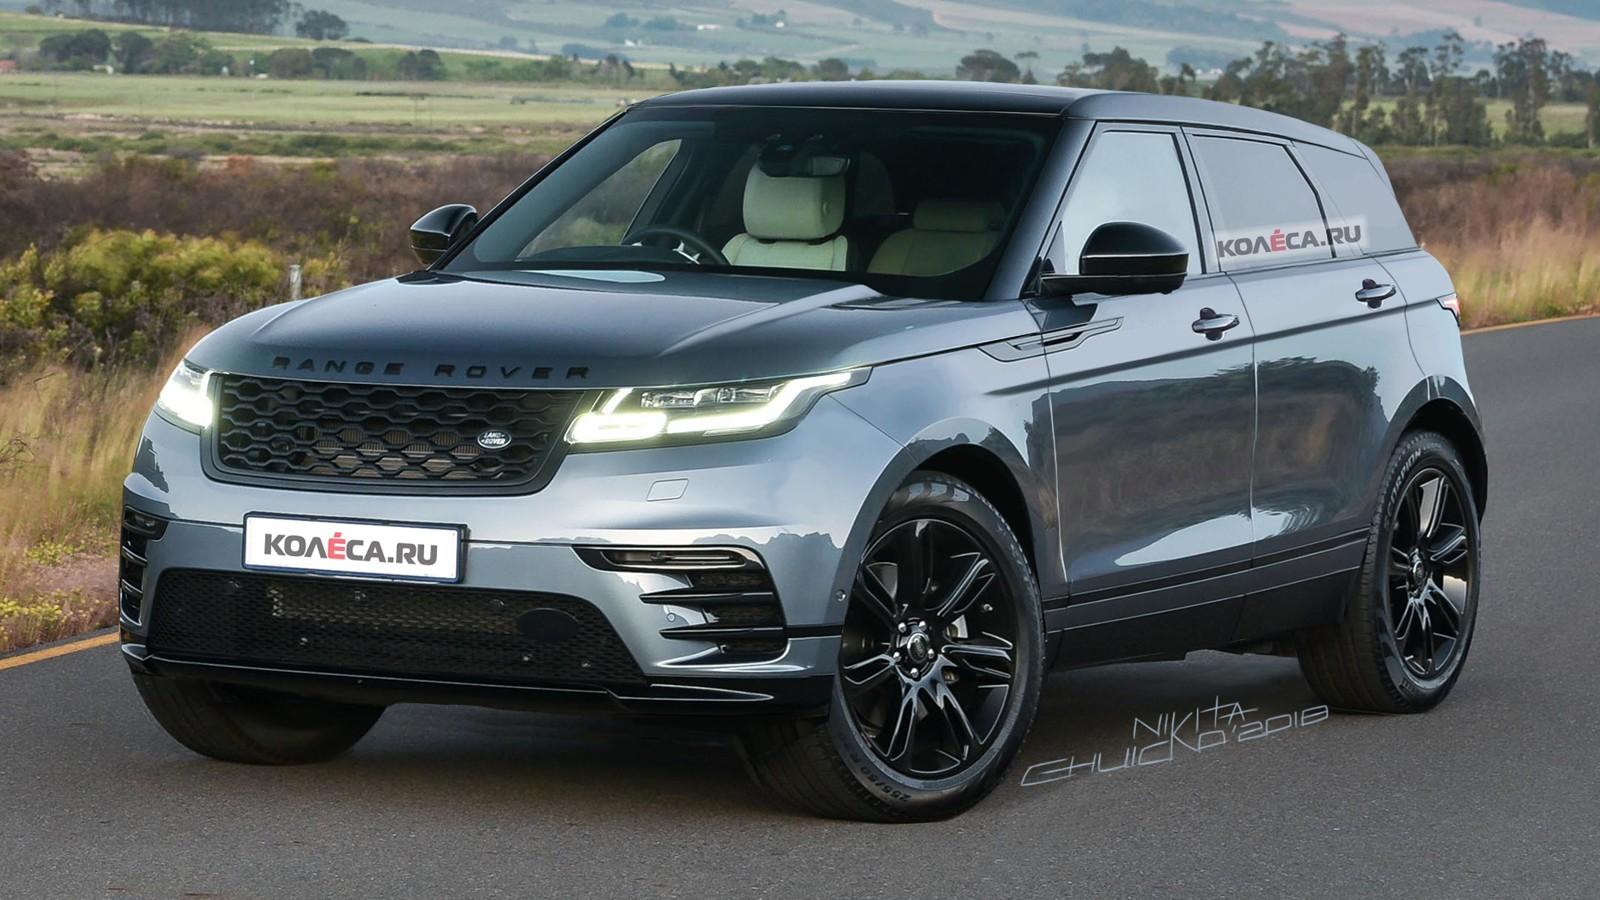 Range Rover Evoque front2